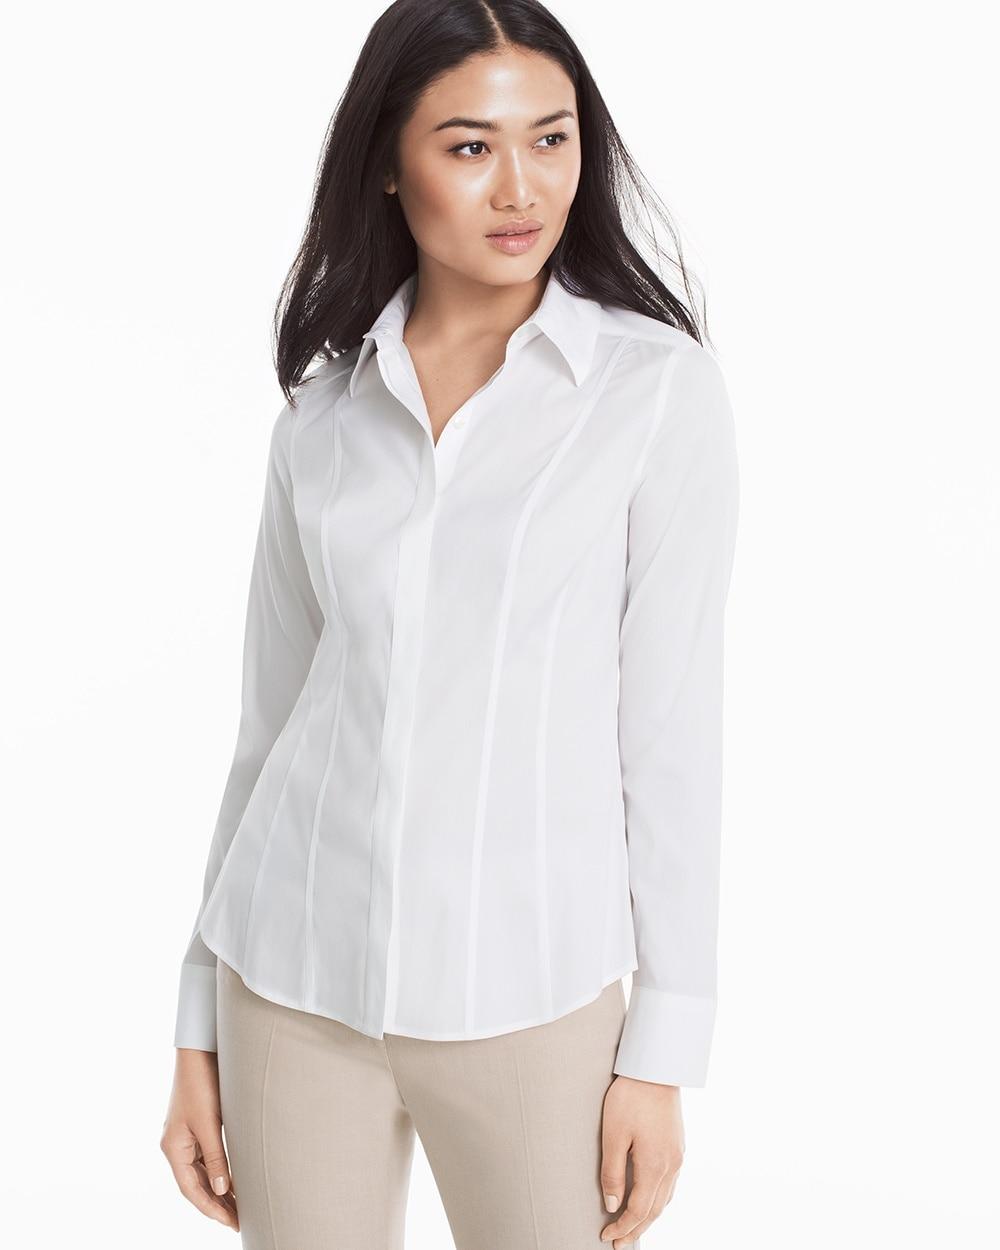 Wrinkle Free Long Sleeve White Poplin Shirt Whbm